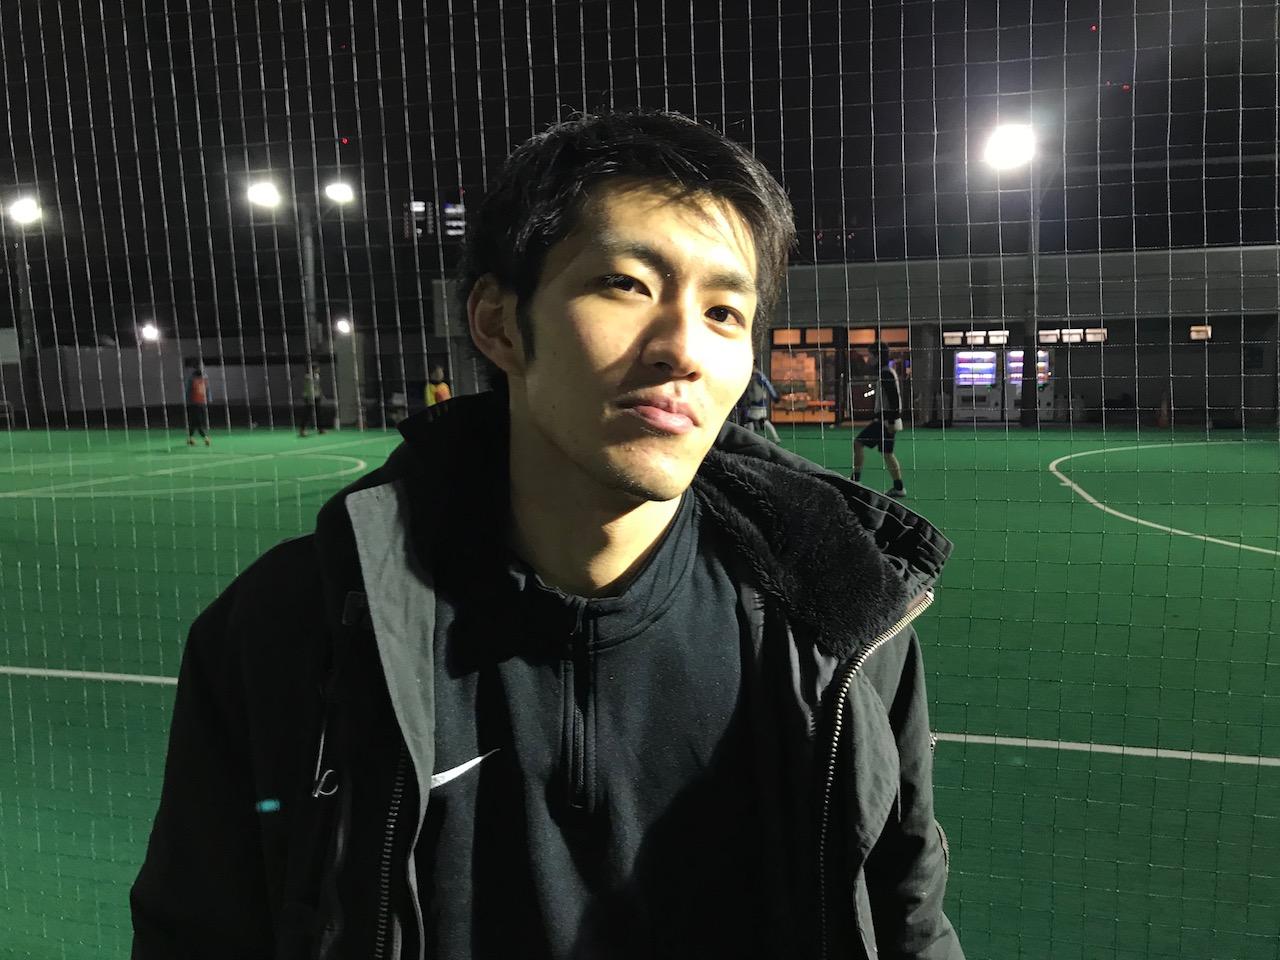 PLAN FC 2018蹴り初め